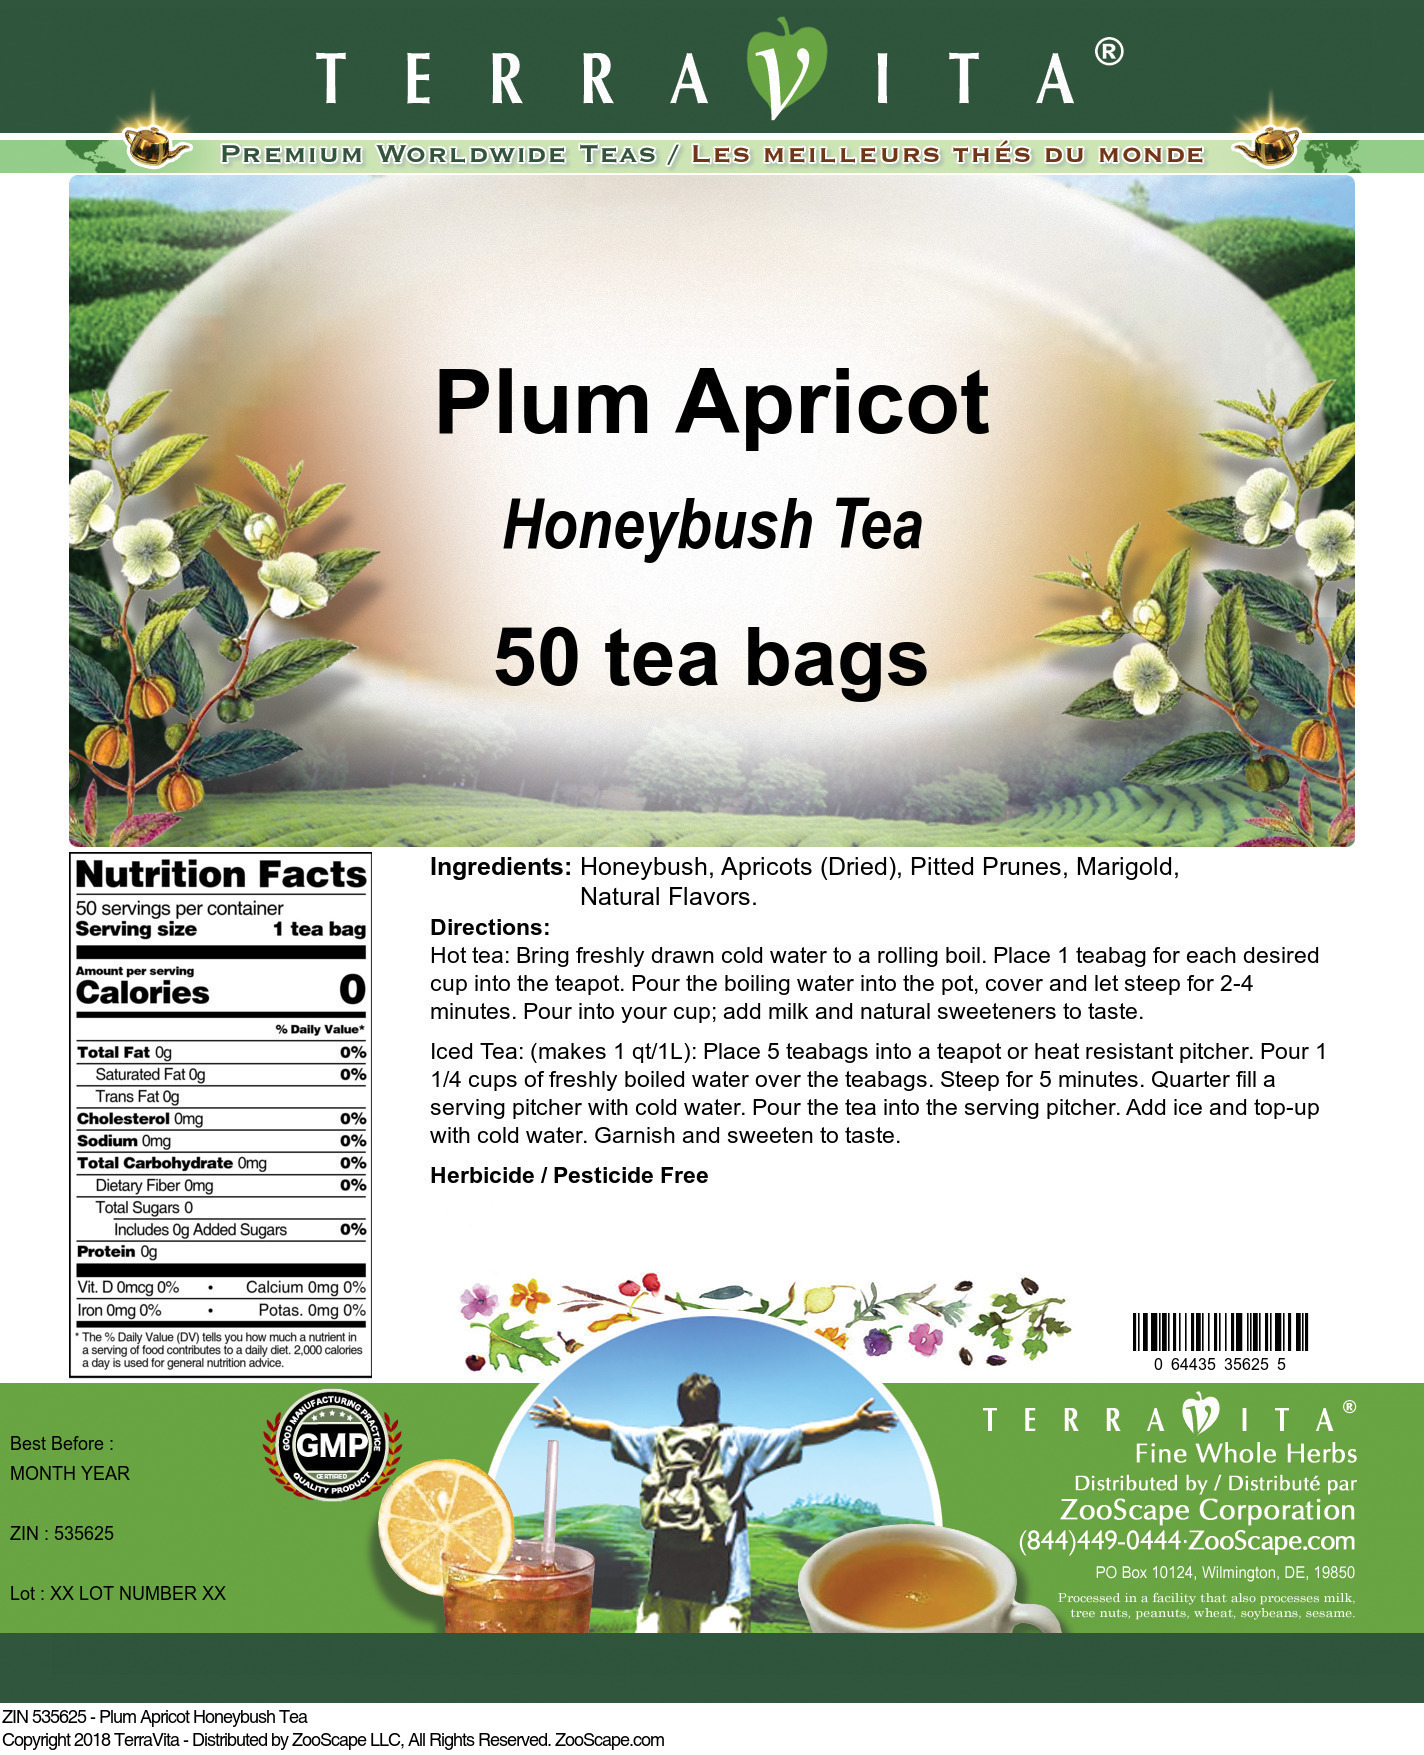 Plum Apricot Honeybush Tea